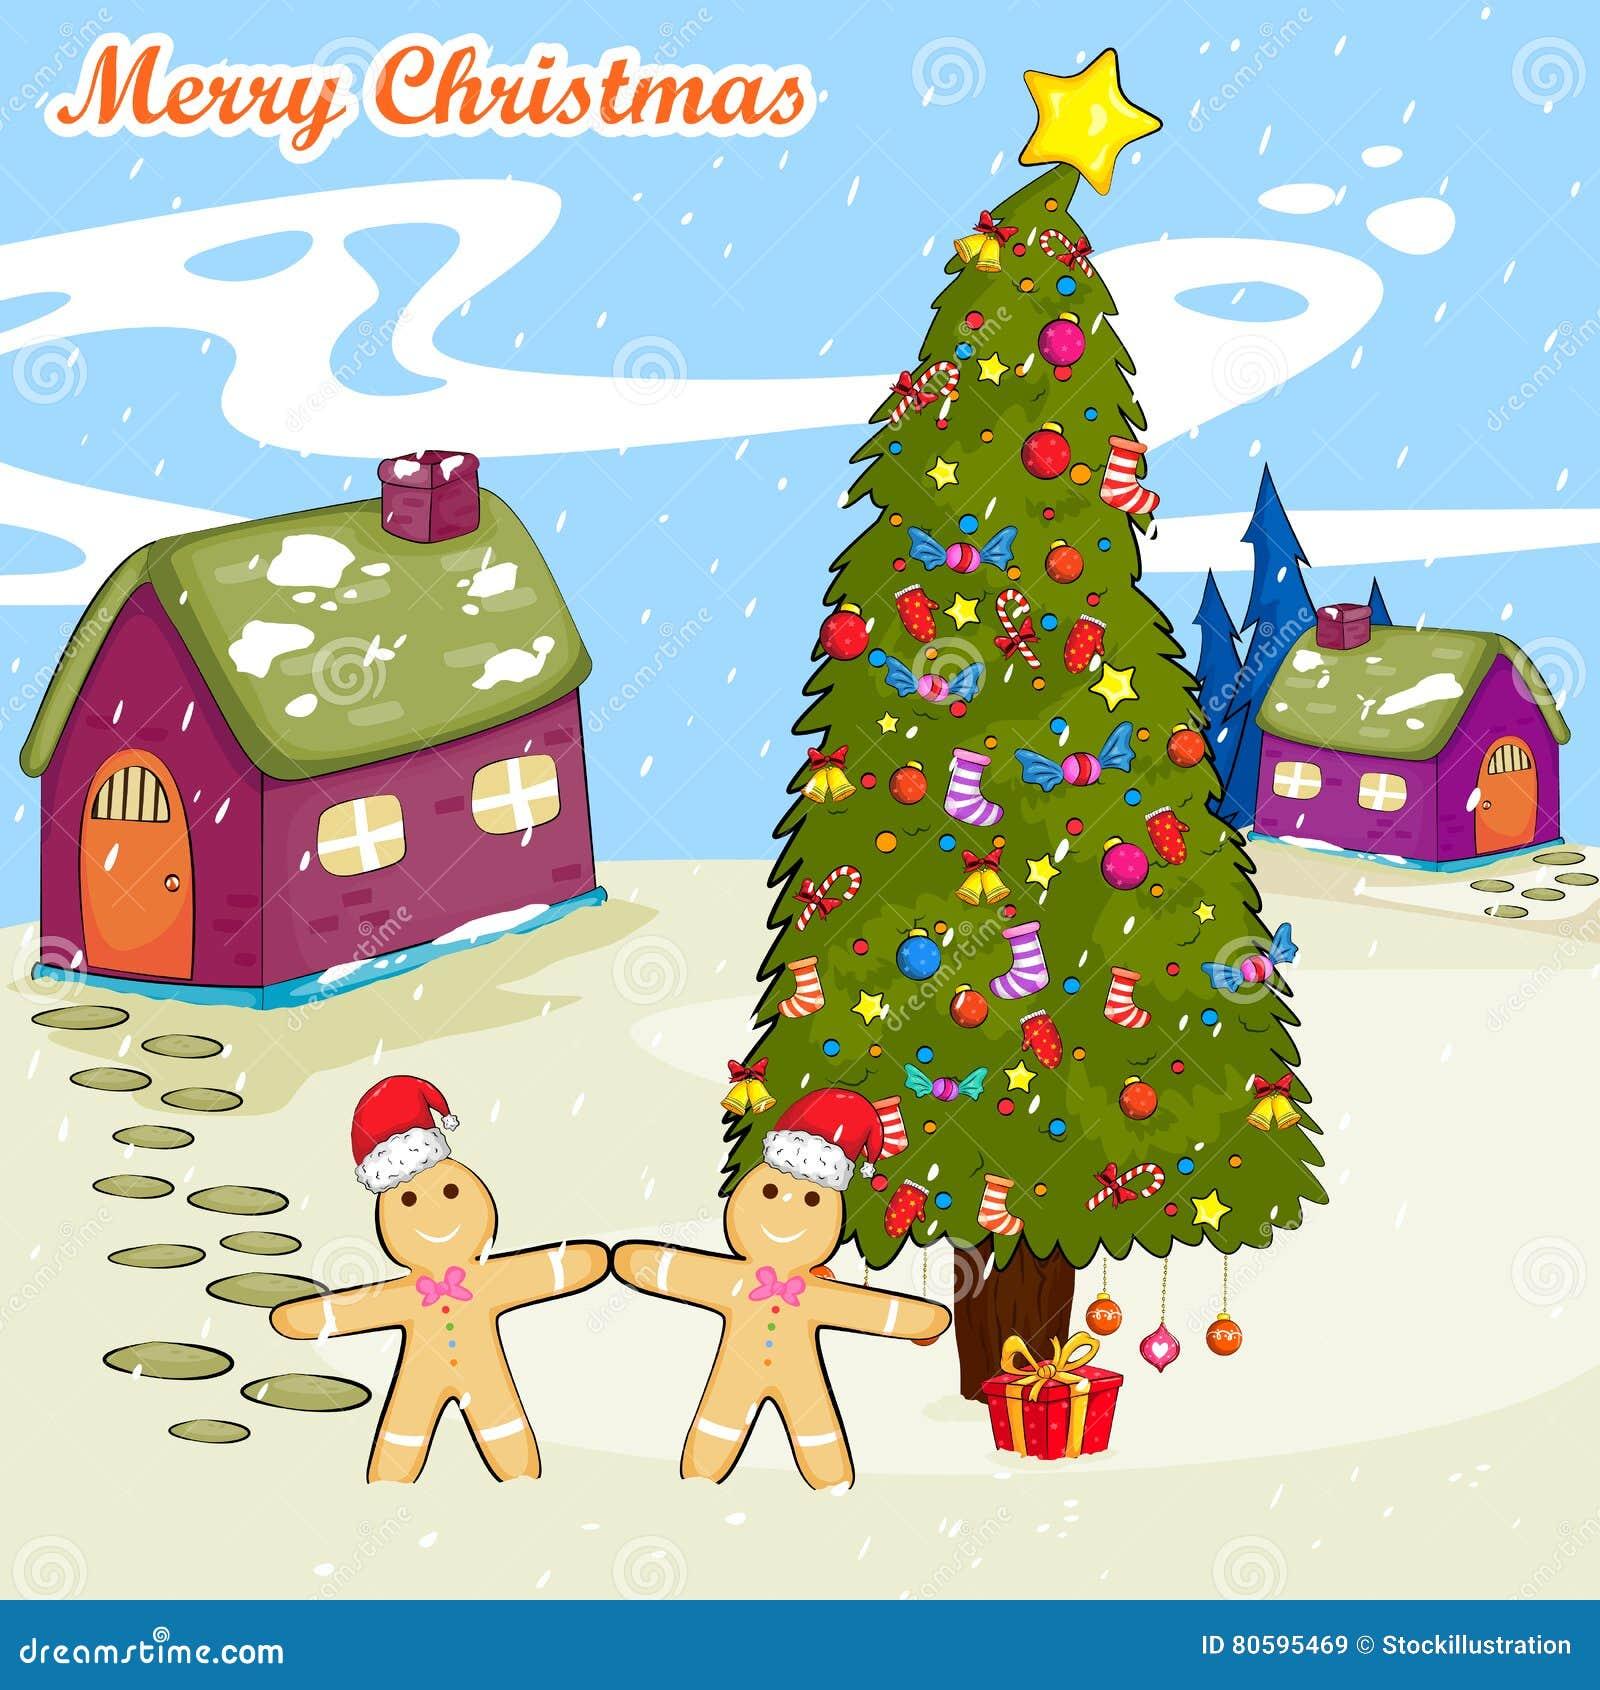 Merry christmas holiday greeting card background stock vector merry christmas holiday greeting card background light festivity kristyandbryce Gallery